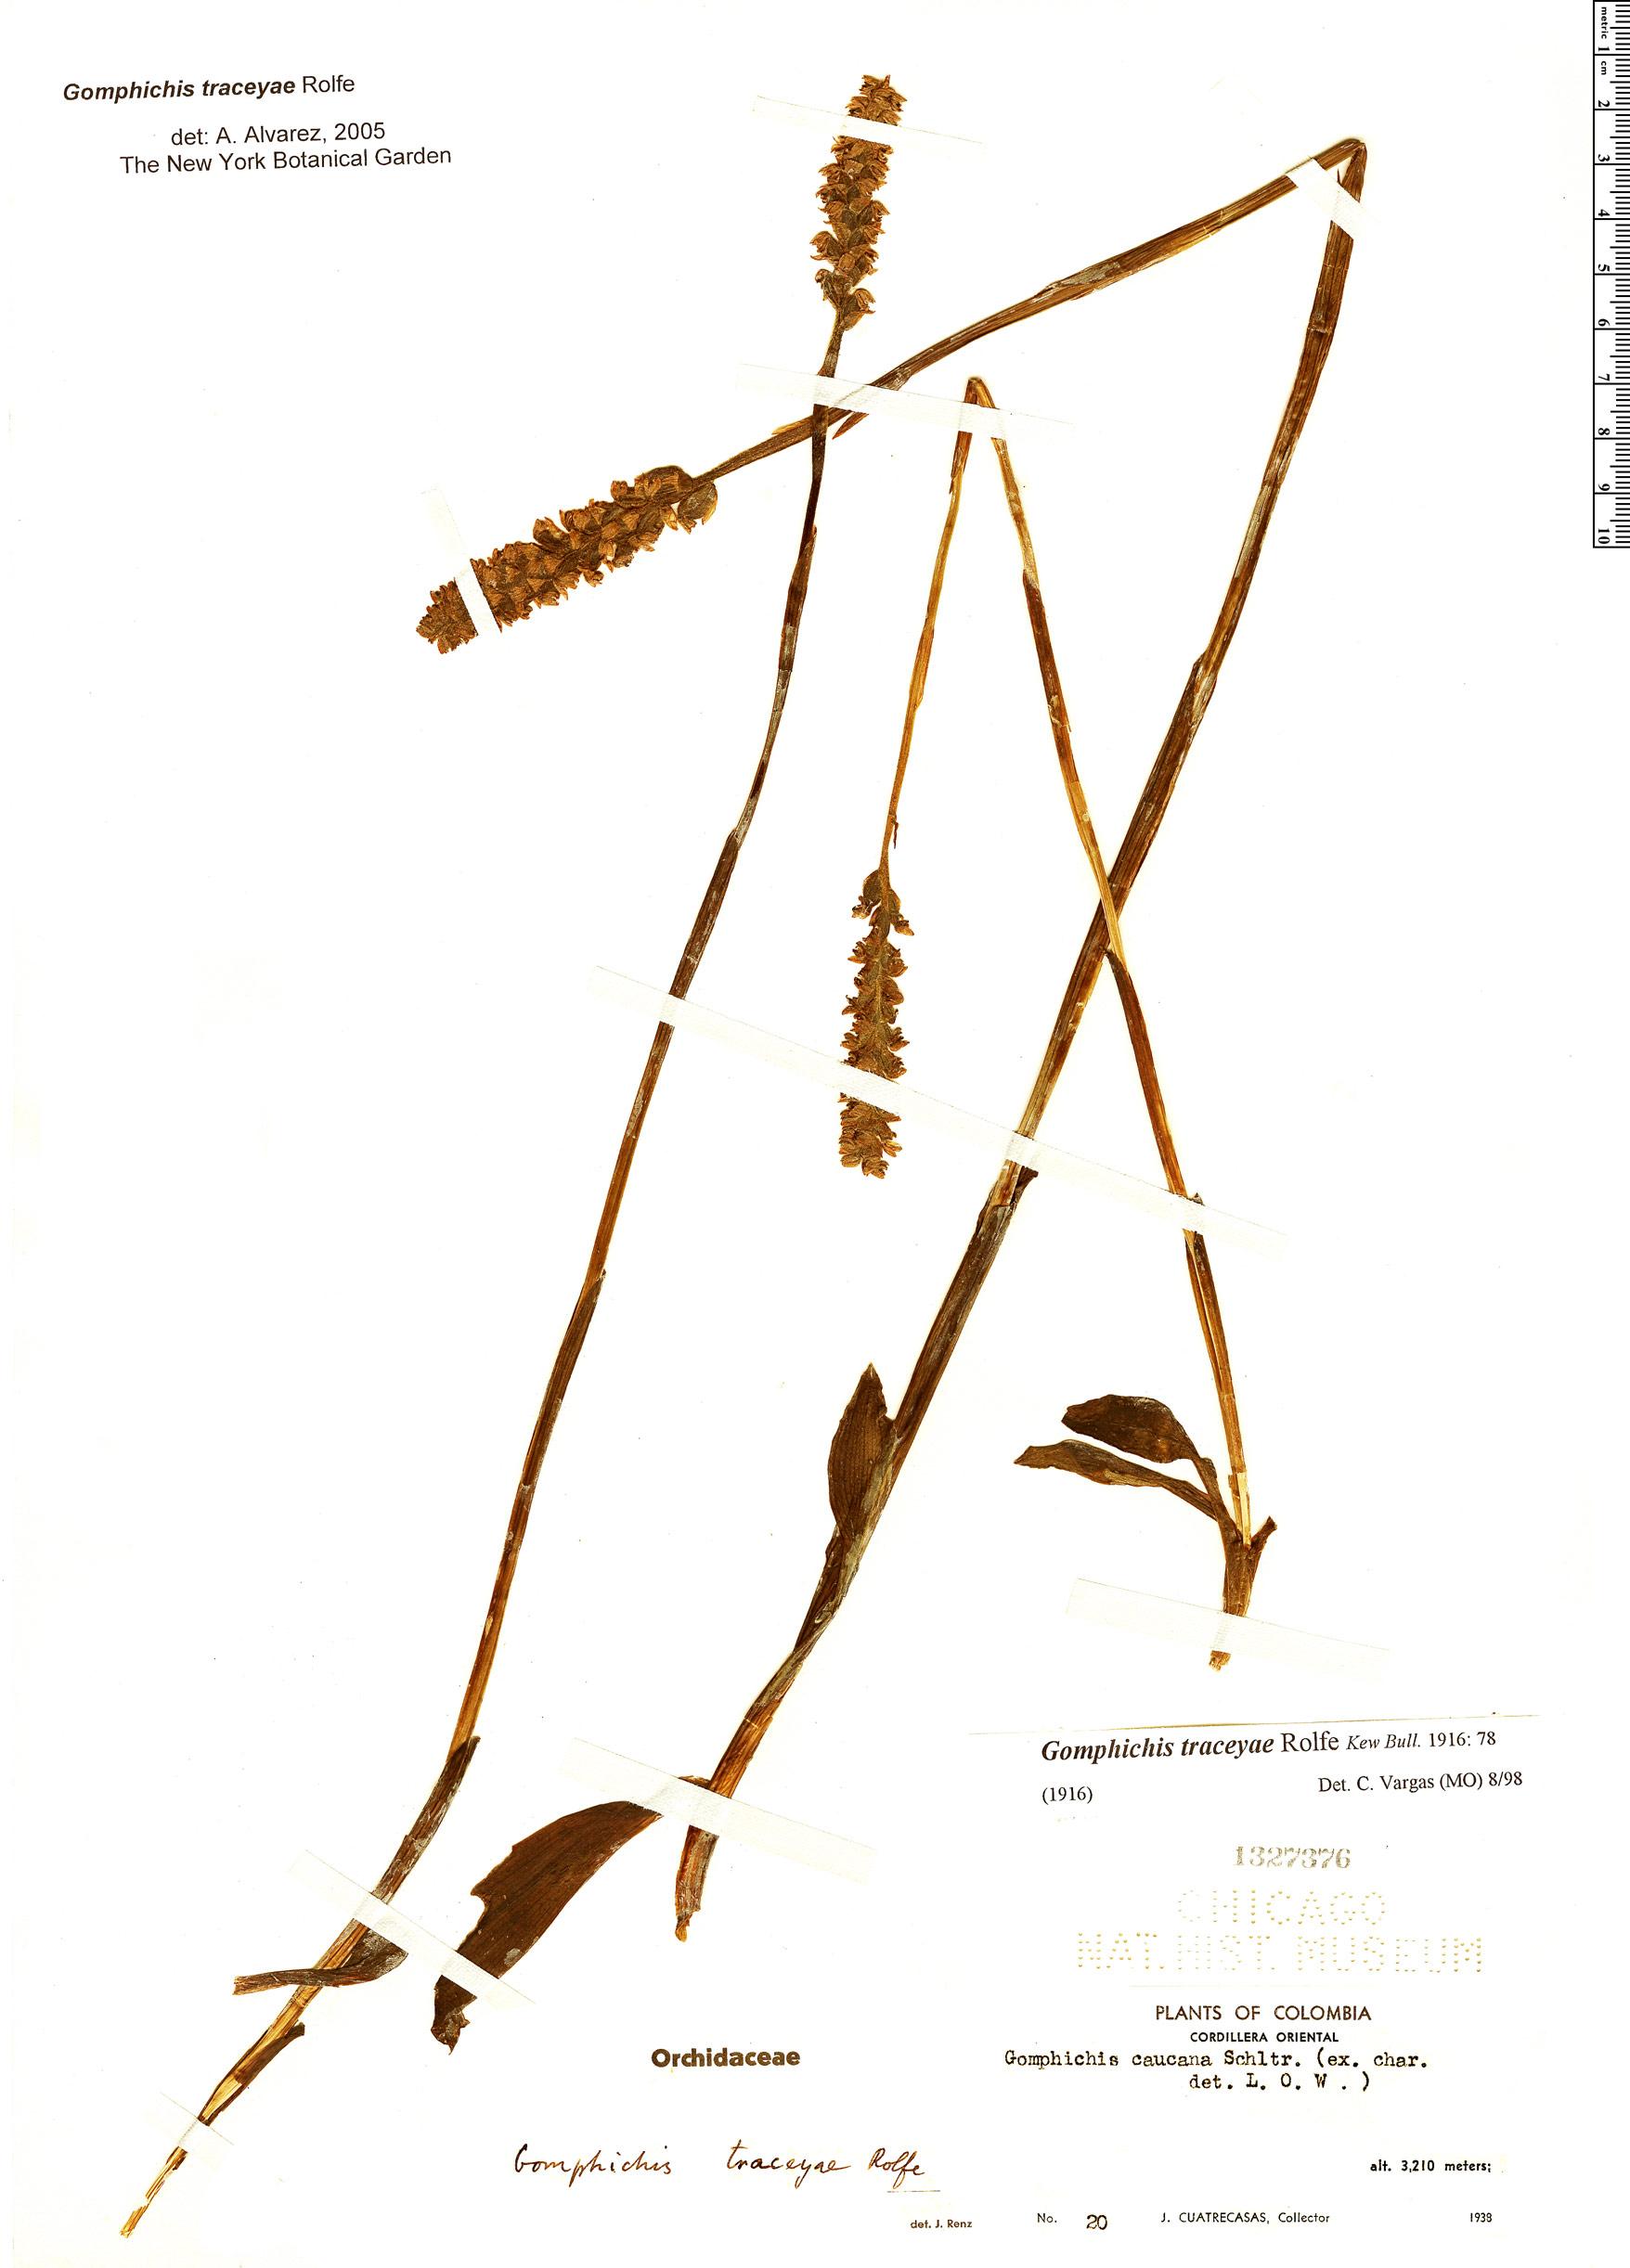 Specimen: Gomphichis traceyae